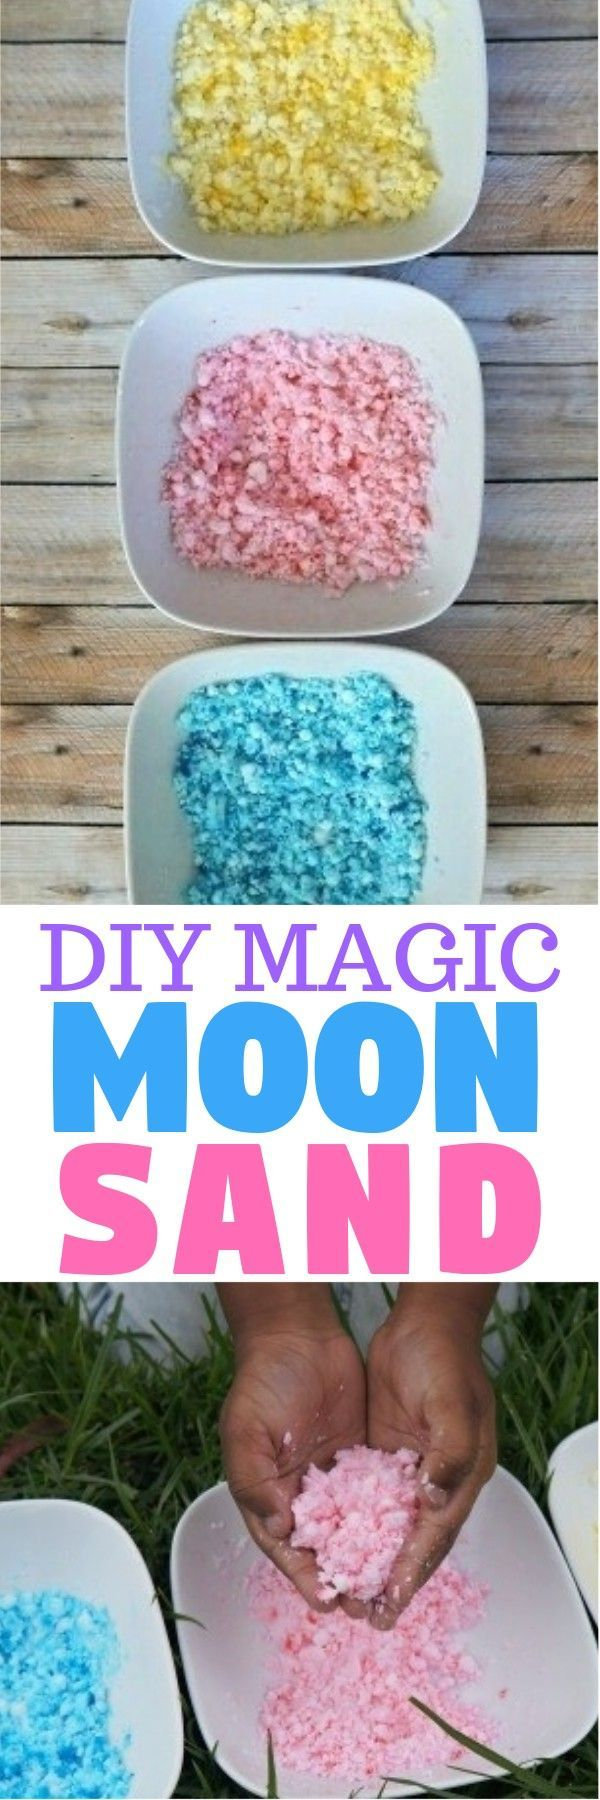 Diy Magic Moon Sand Recipe Build And Mold Sand For Fun Sensory